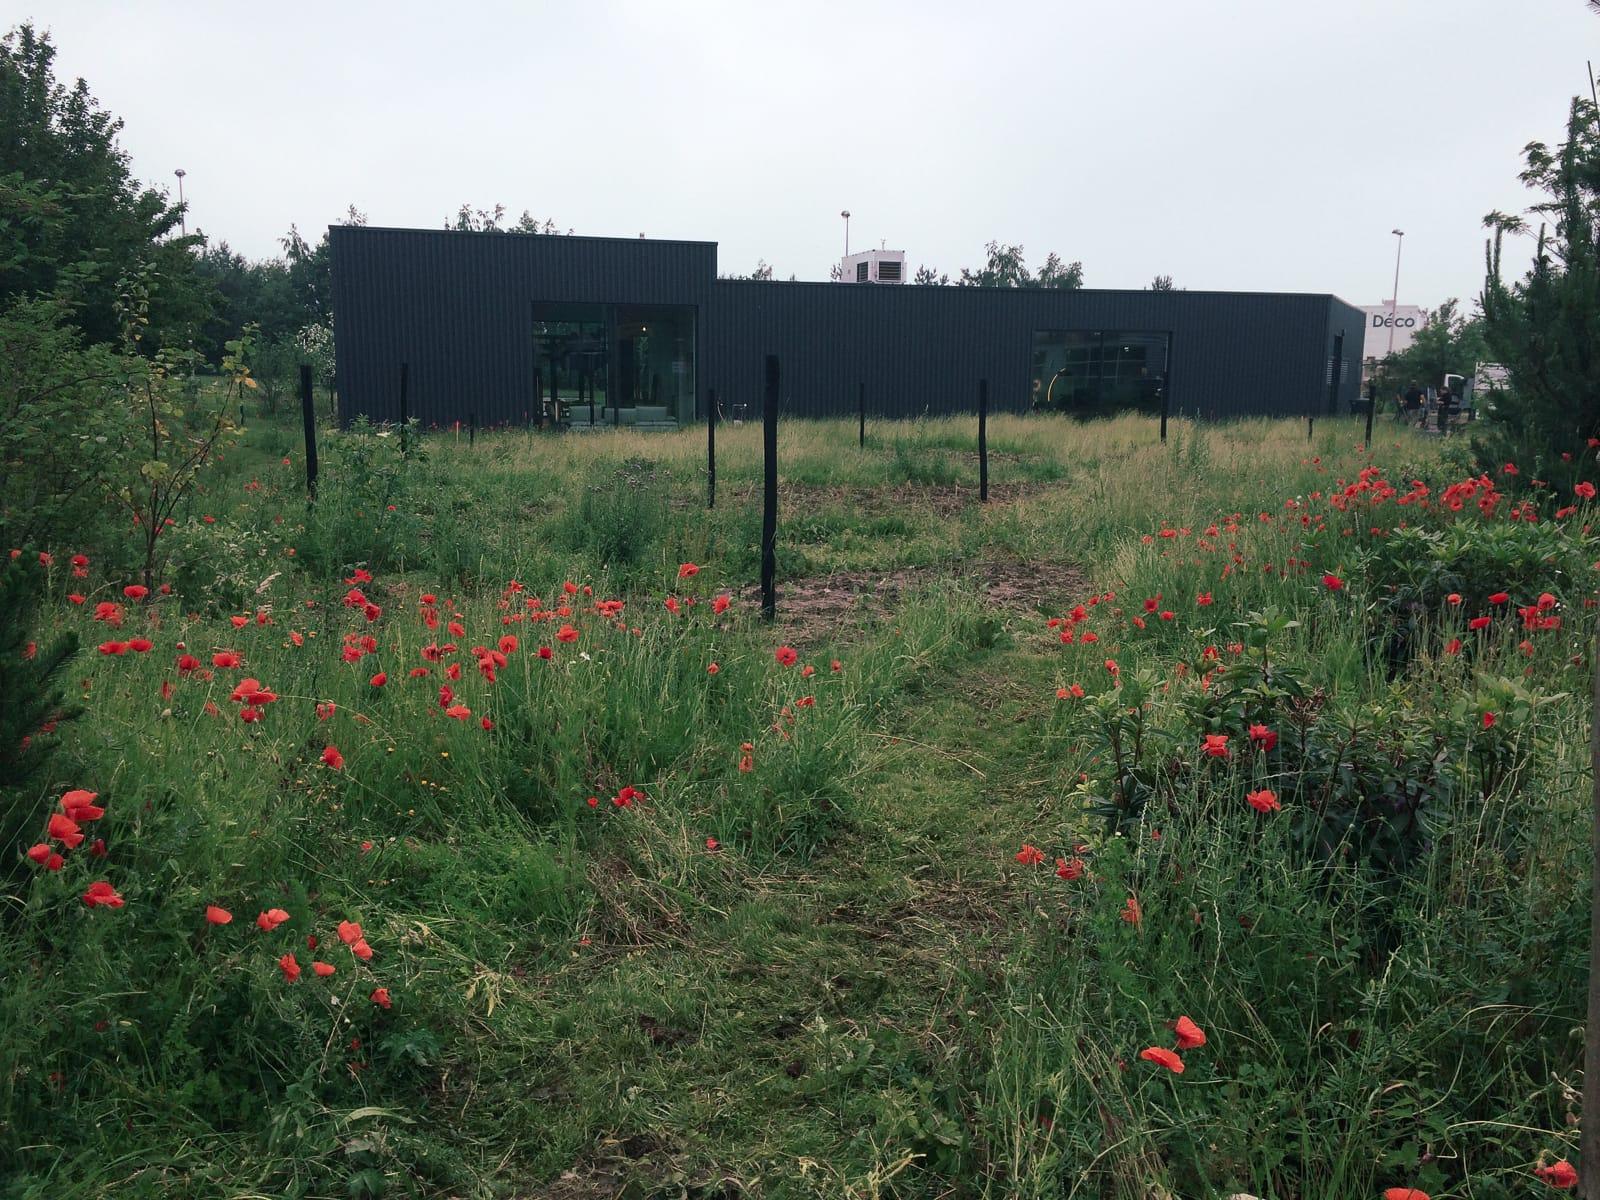 Prairie spontanée + semis plantes indigènes Élevation prairie vs zac jardin naturaliste ®Hermeline Carpentier